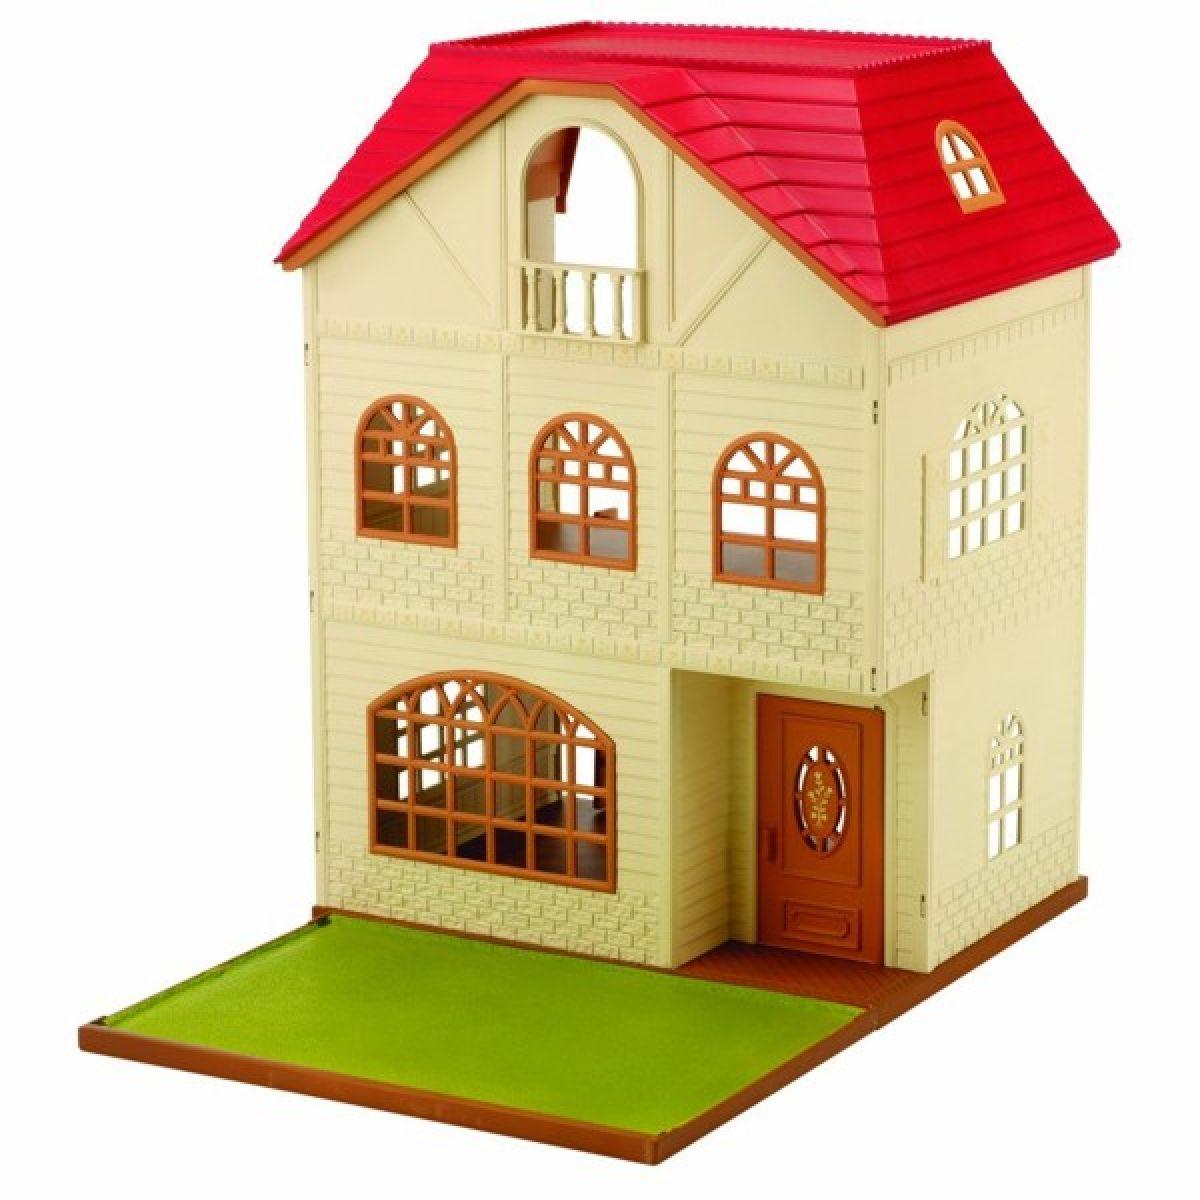 Sylvanian Families Trojposchodový domček